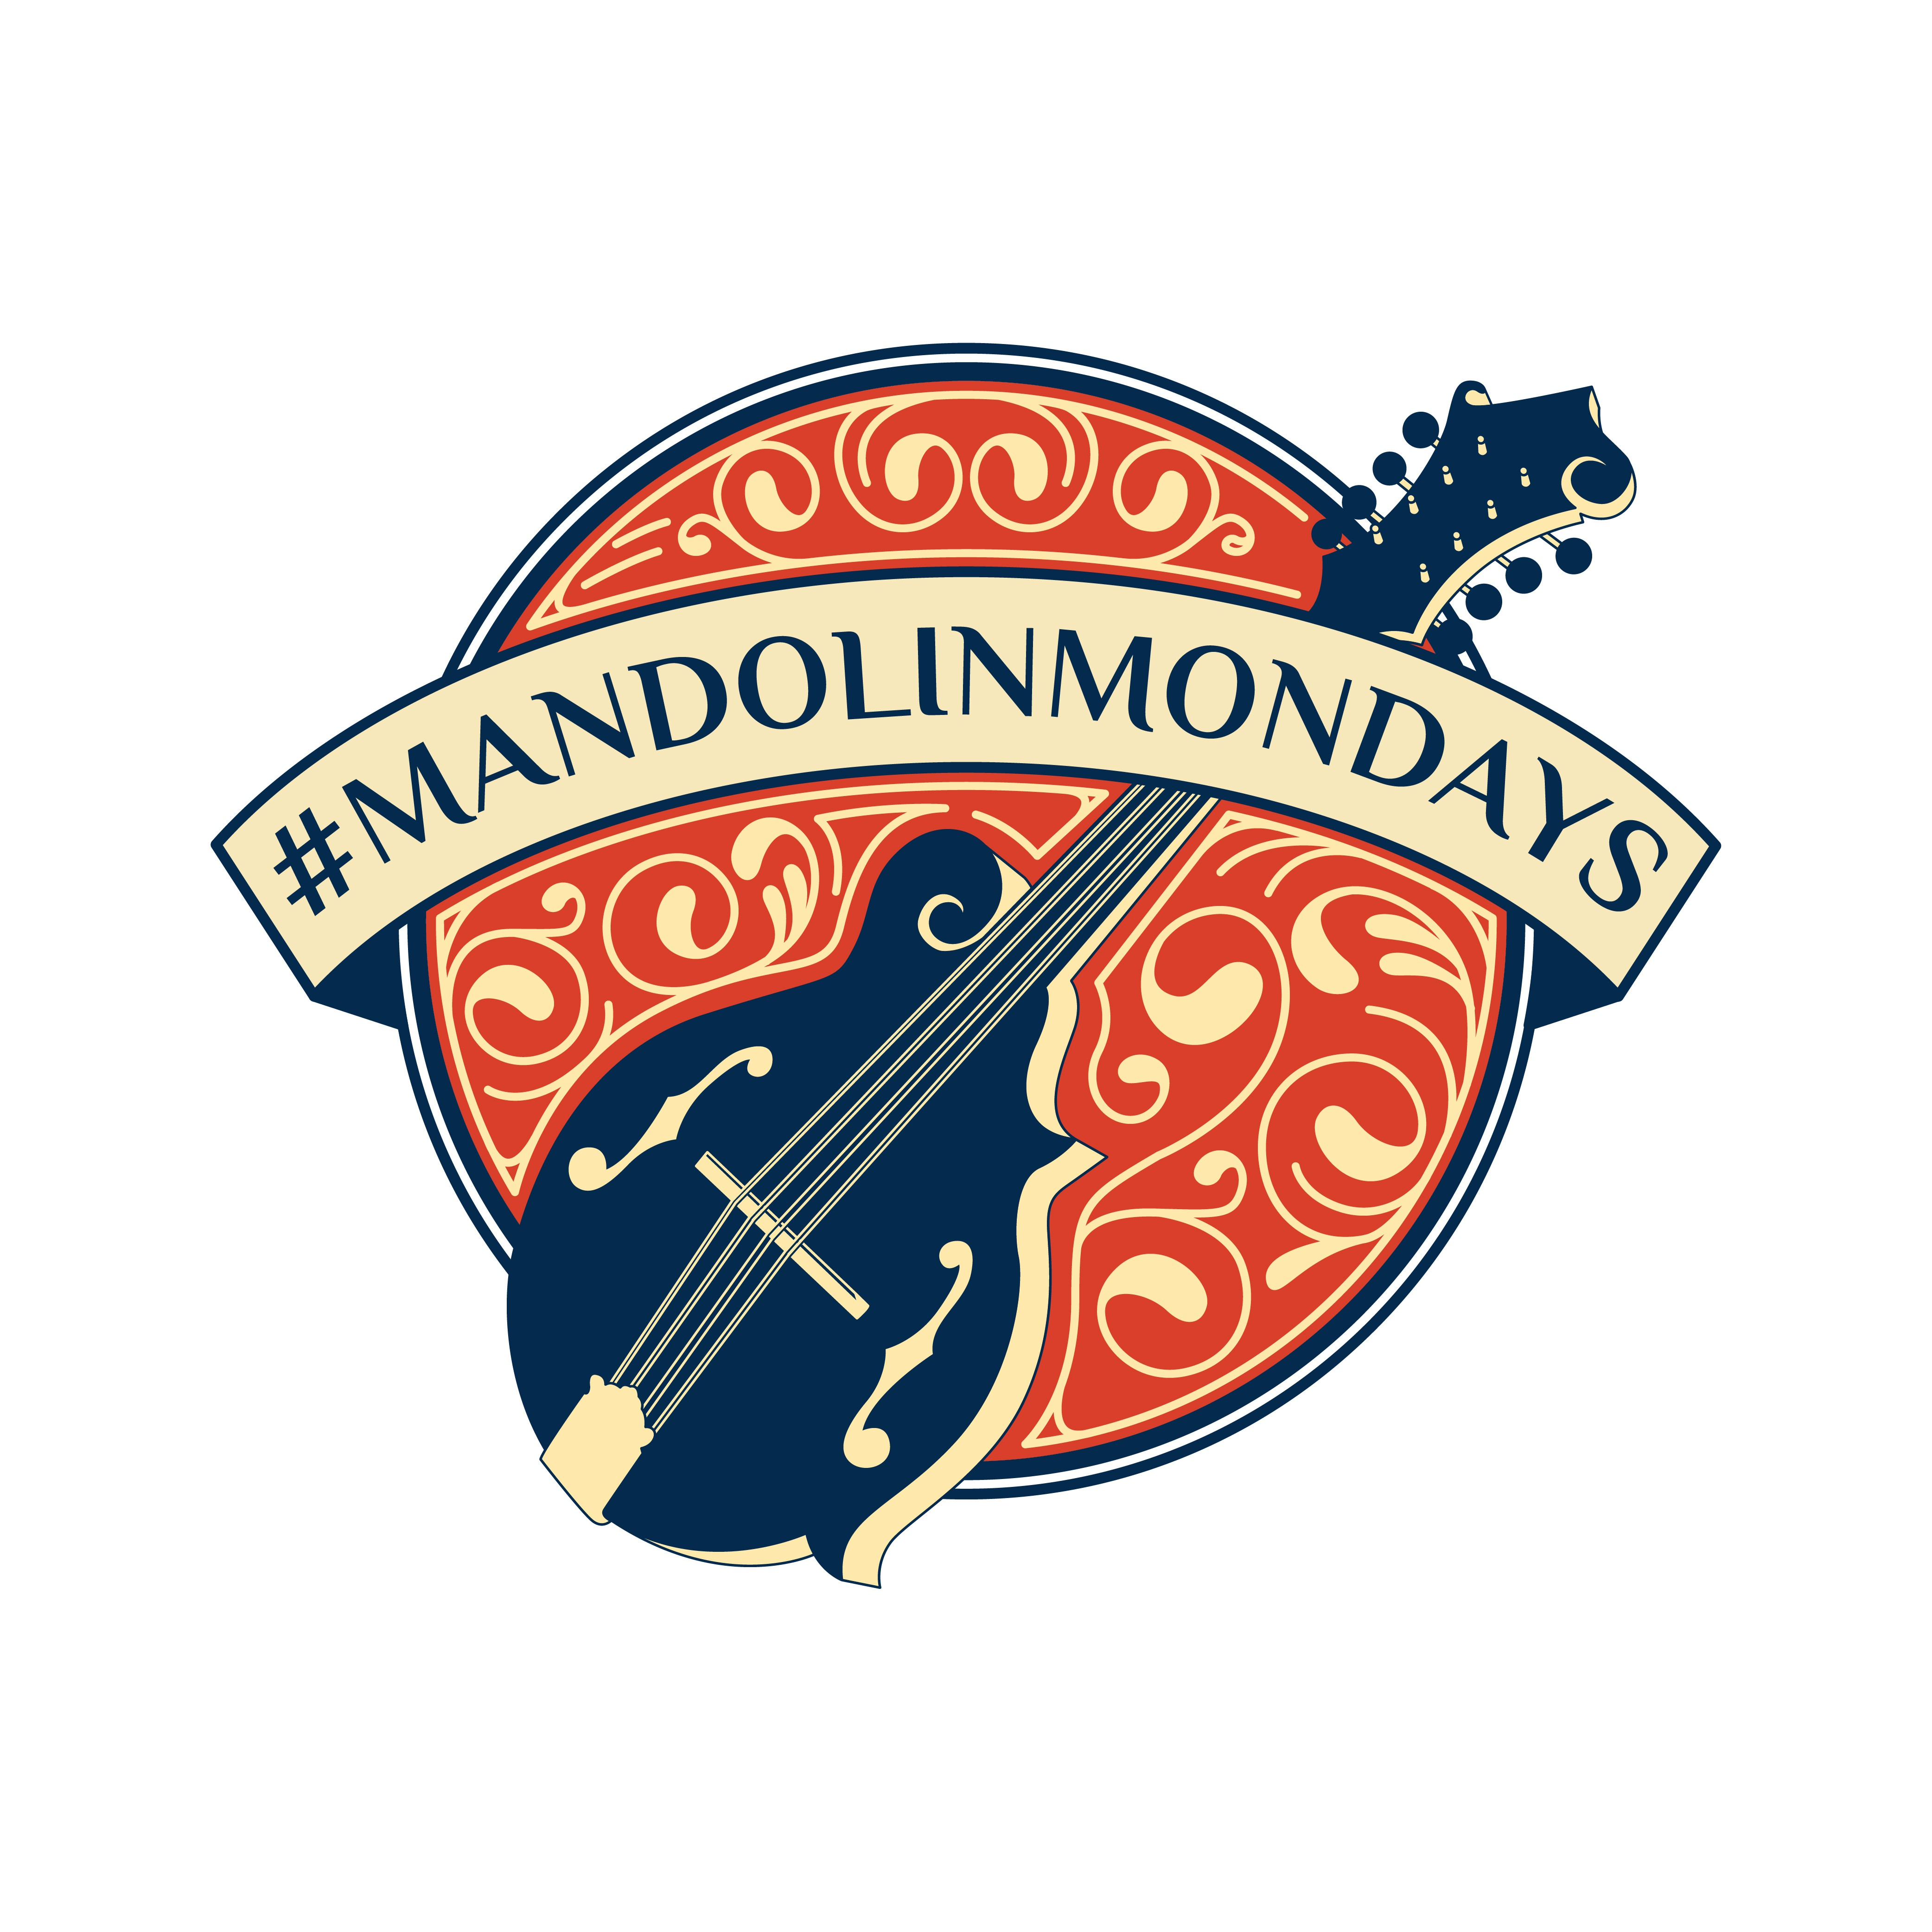 Design a logo for the acoustic music nerd video blog #mandolinmondays